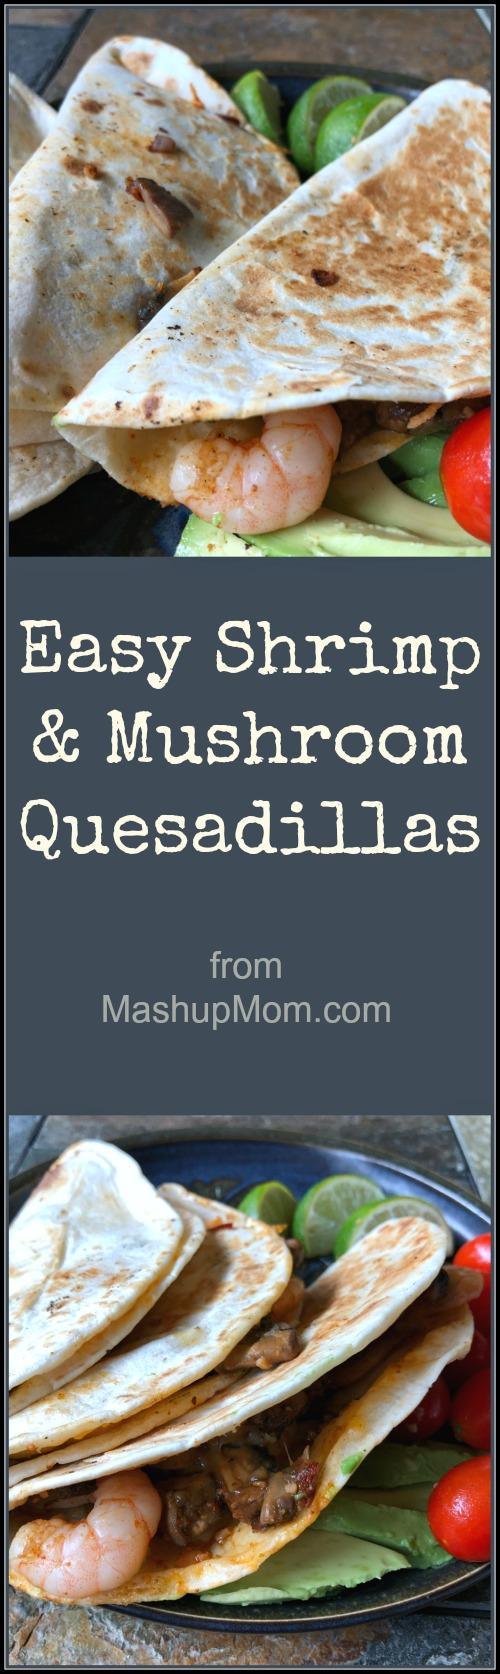 easy mushroom & shrimp quesadillas